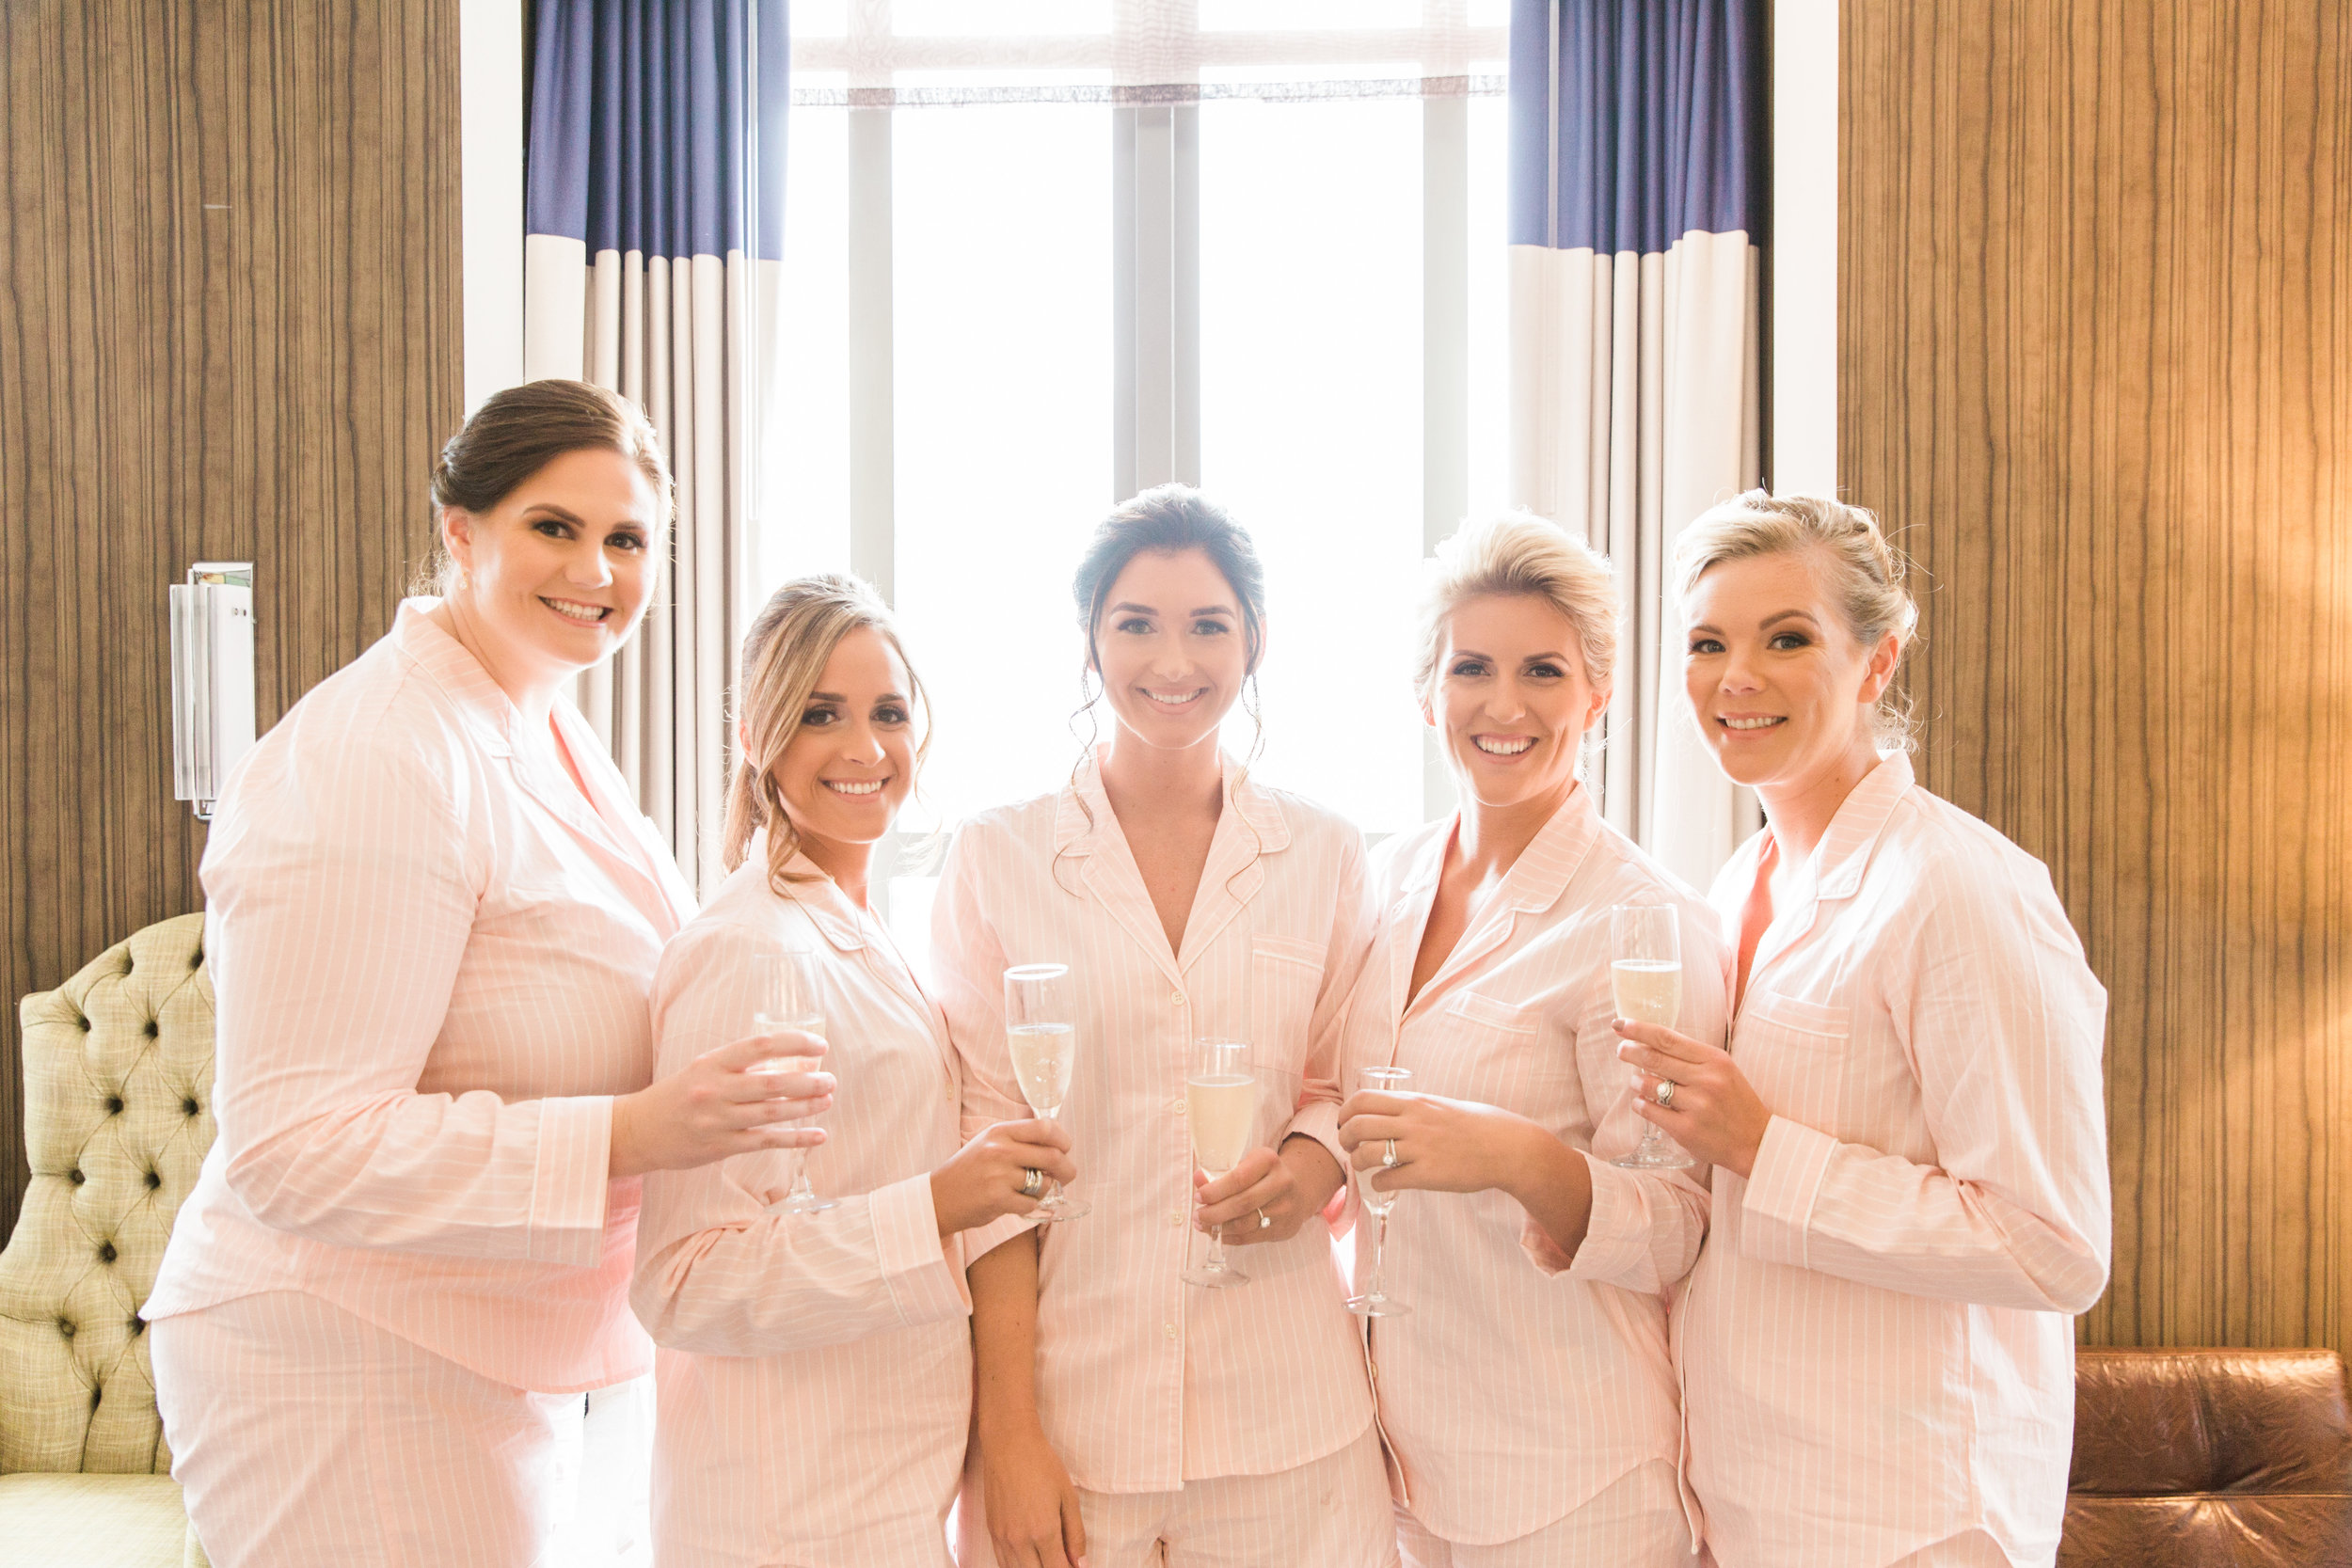 Hudson-Nichols-Black-Tie-Bride-Philadelphia-Waterworks-Wedding-Getting-Ready-Photos-07.jpg